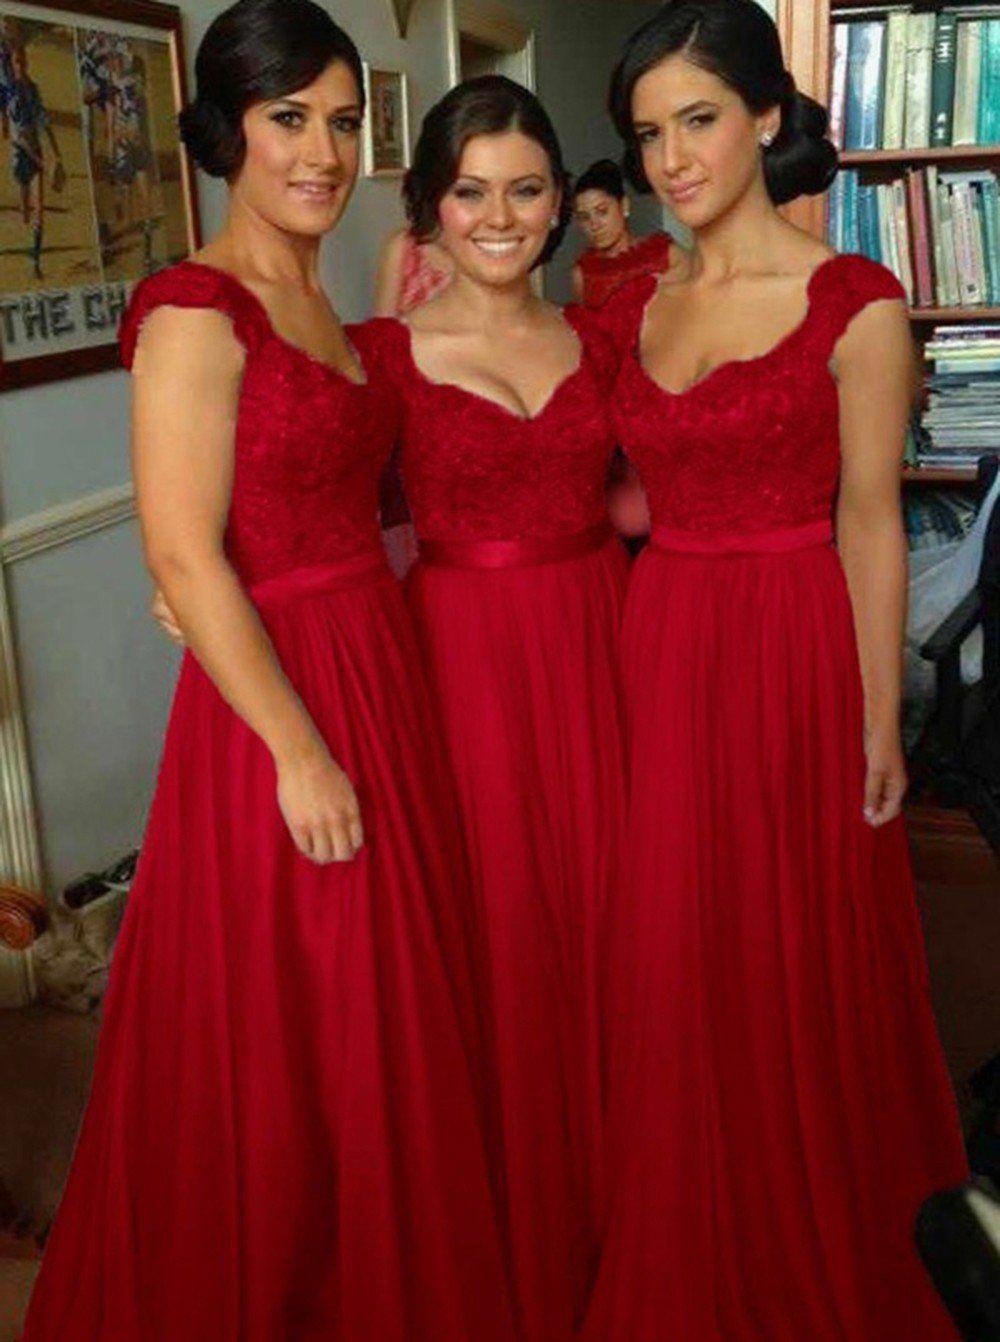 Vestidos de dama de honor realmente maravilloso puntero para descubrir  – Boda